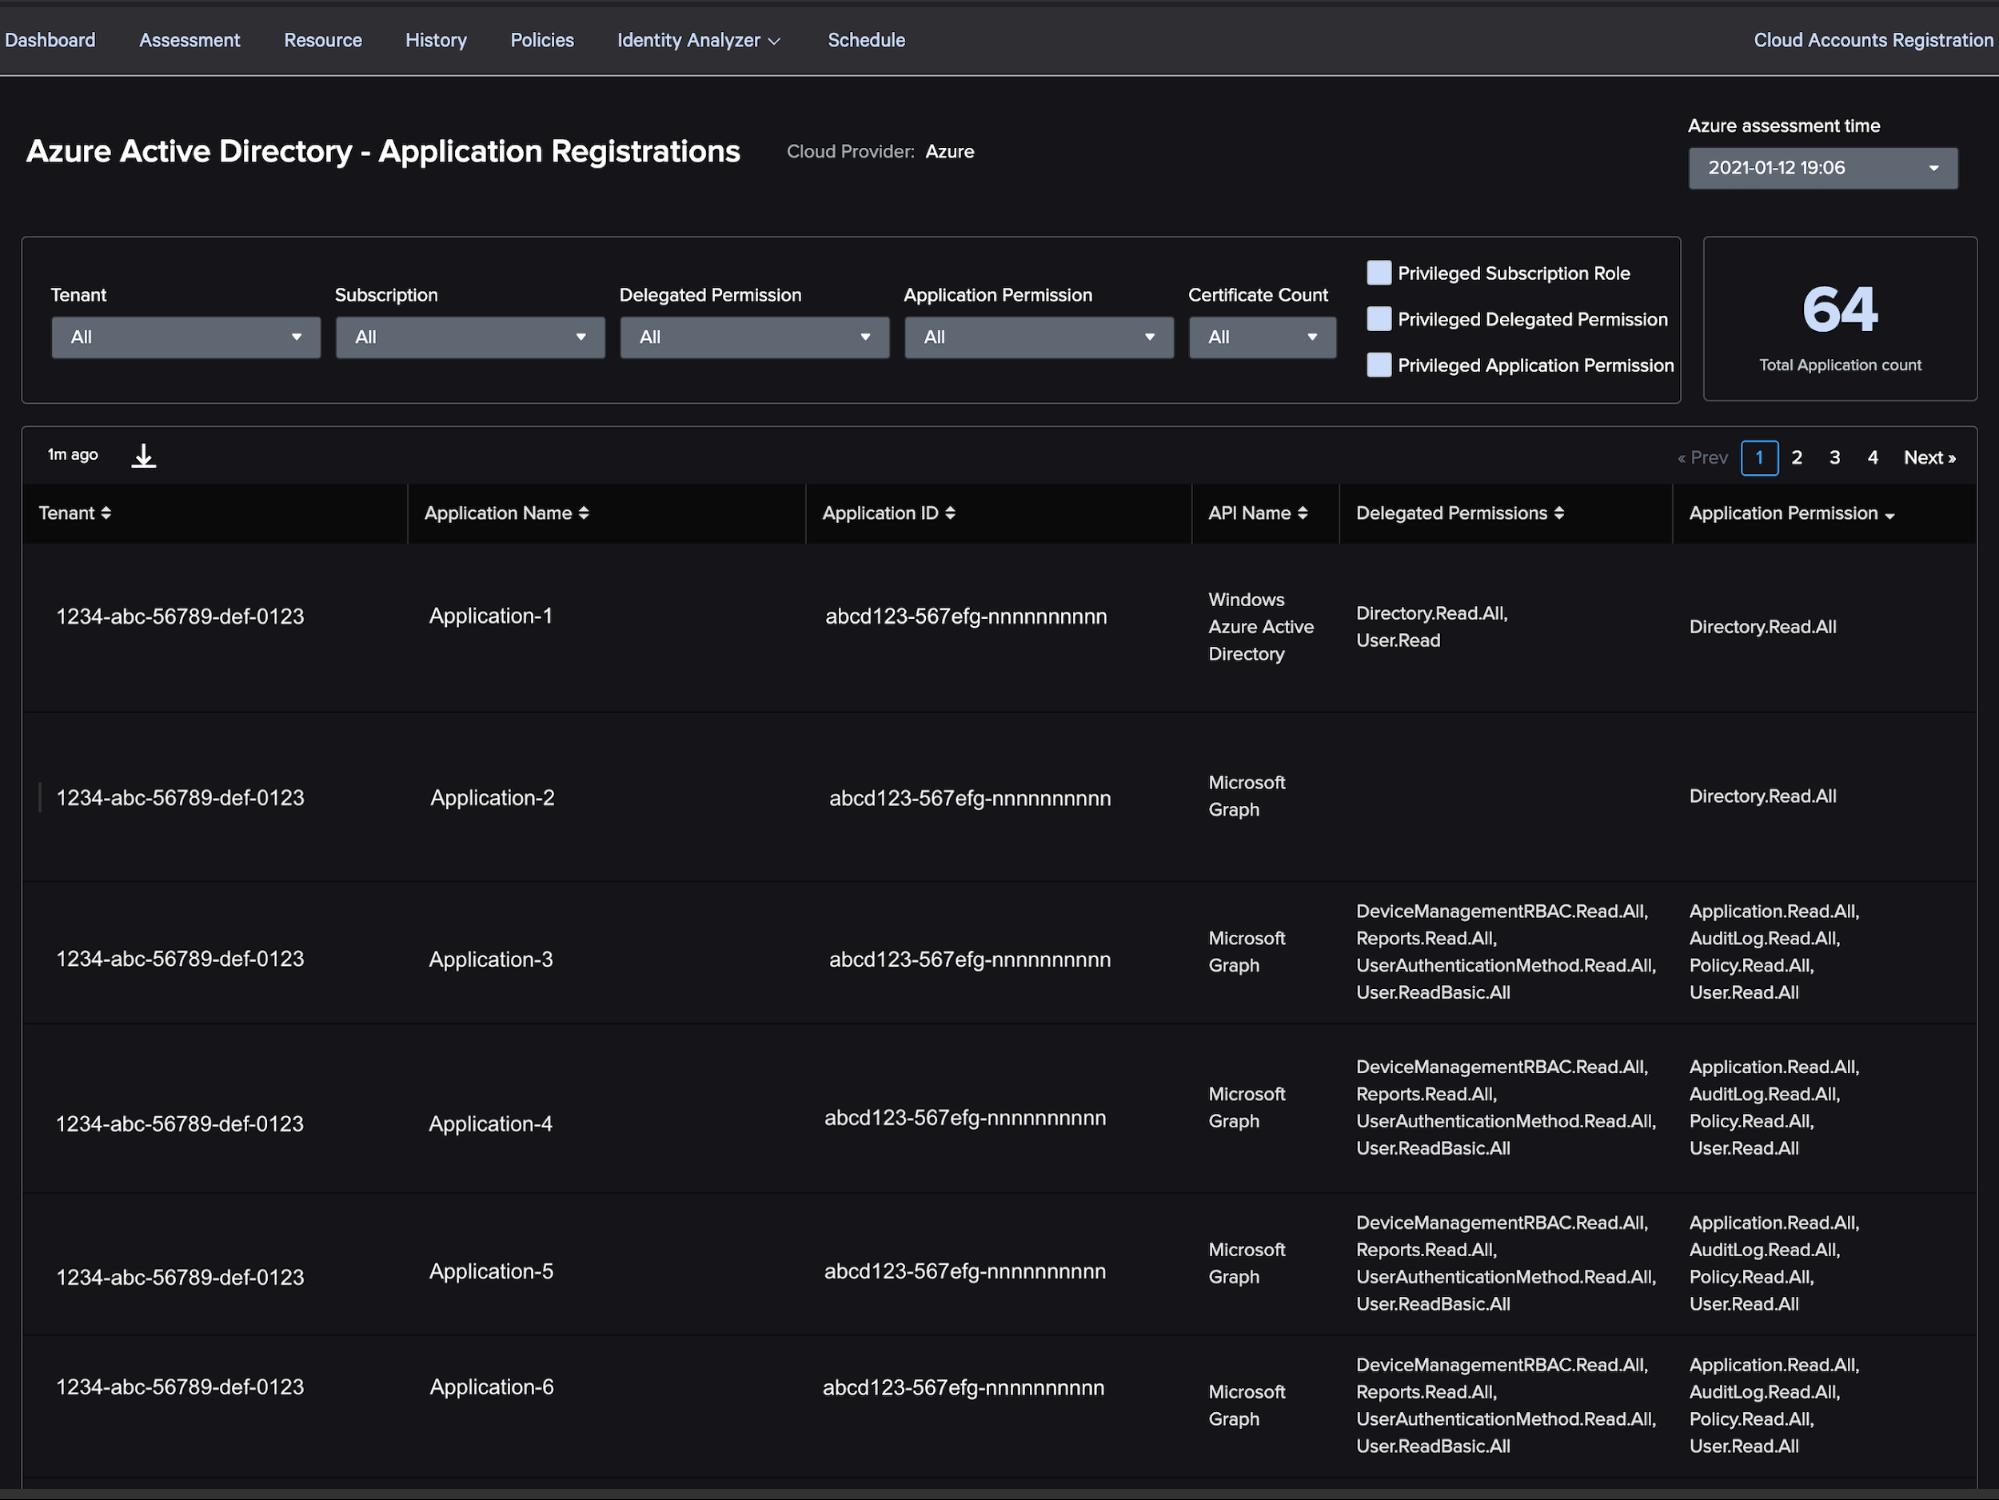 Azure AD app registrations